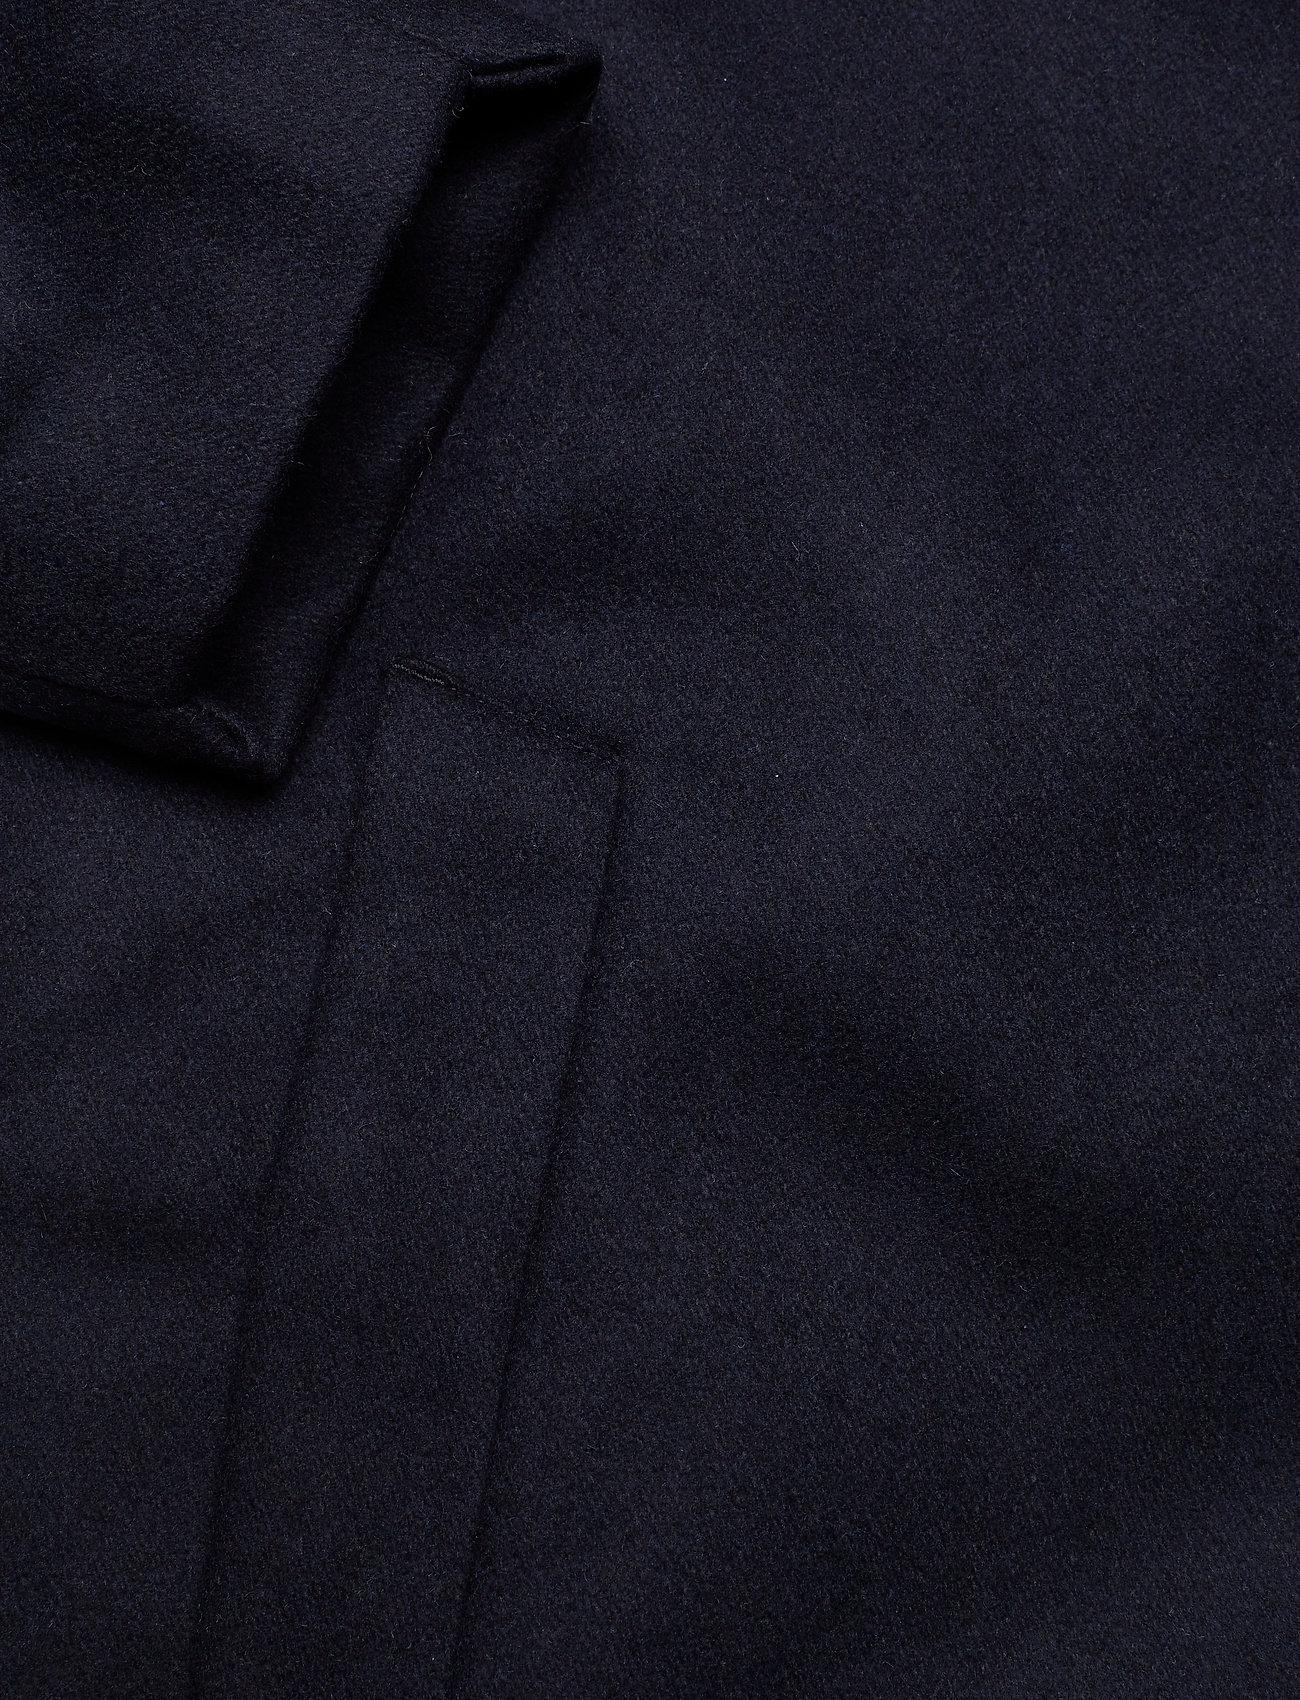 Nn07 Everest 8190 - Jackor & Rockar Navy Blue